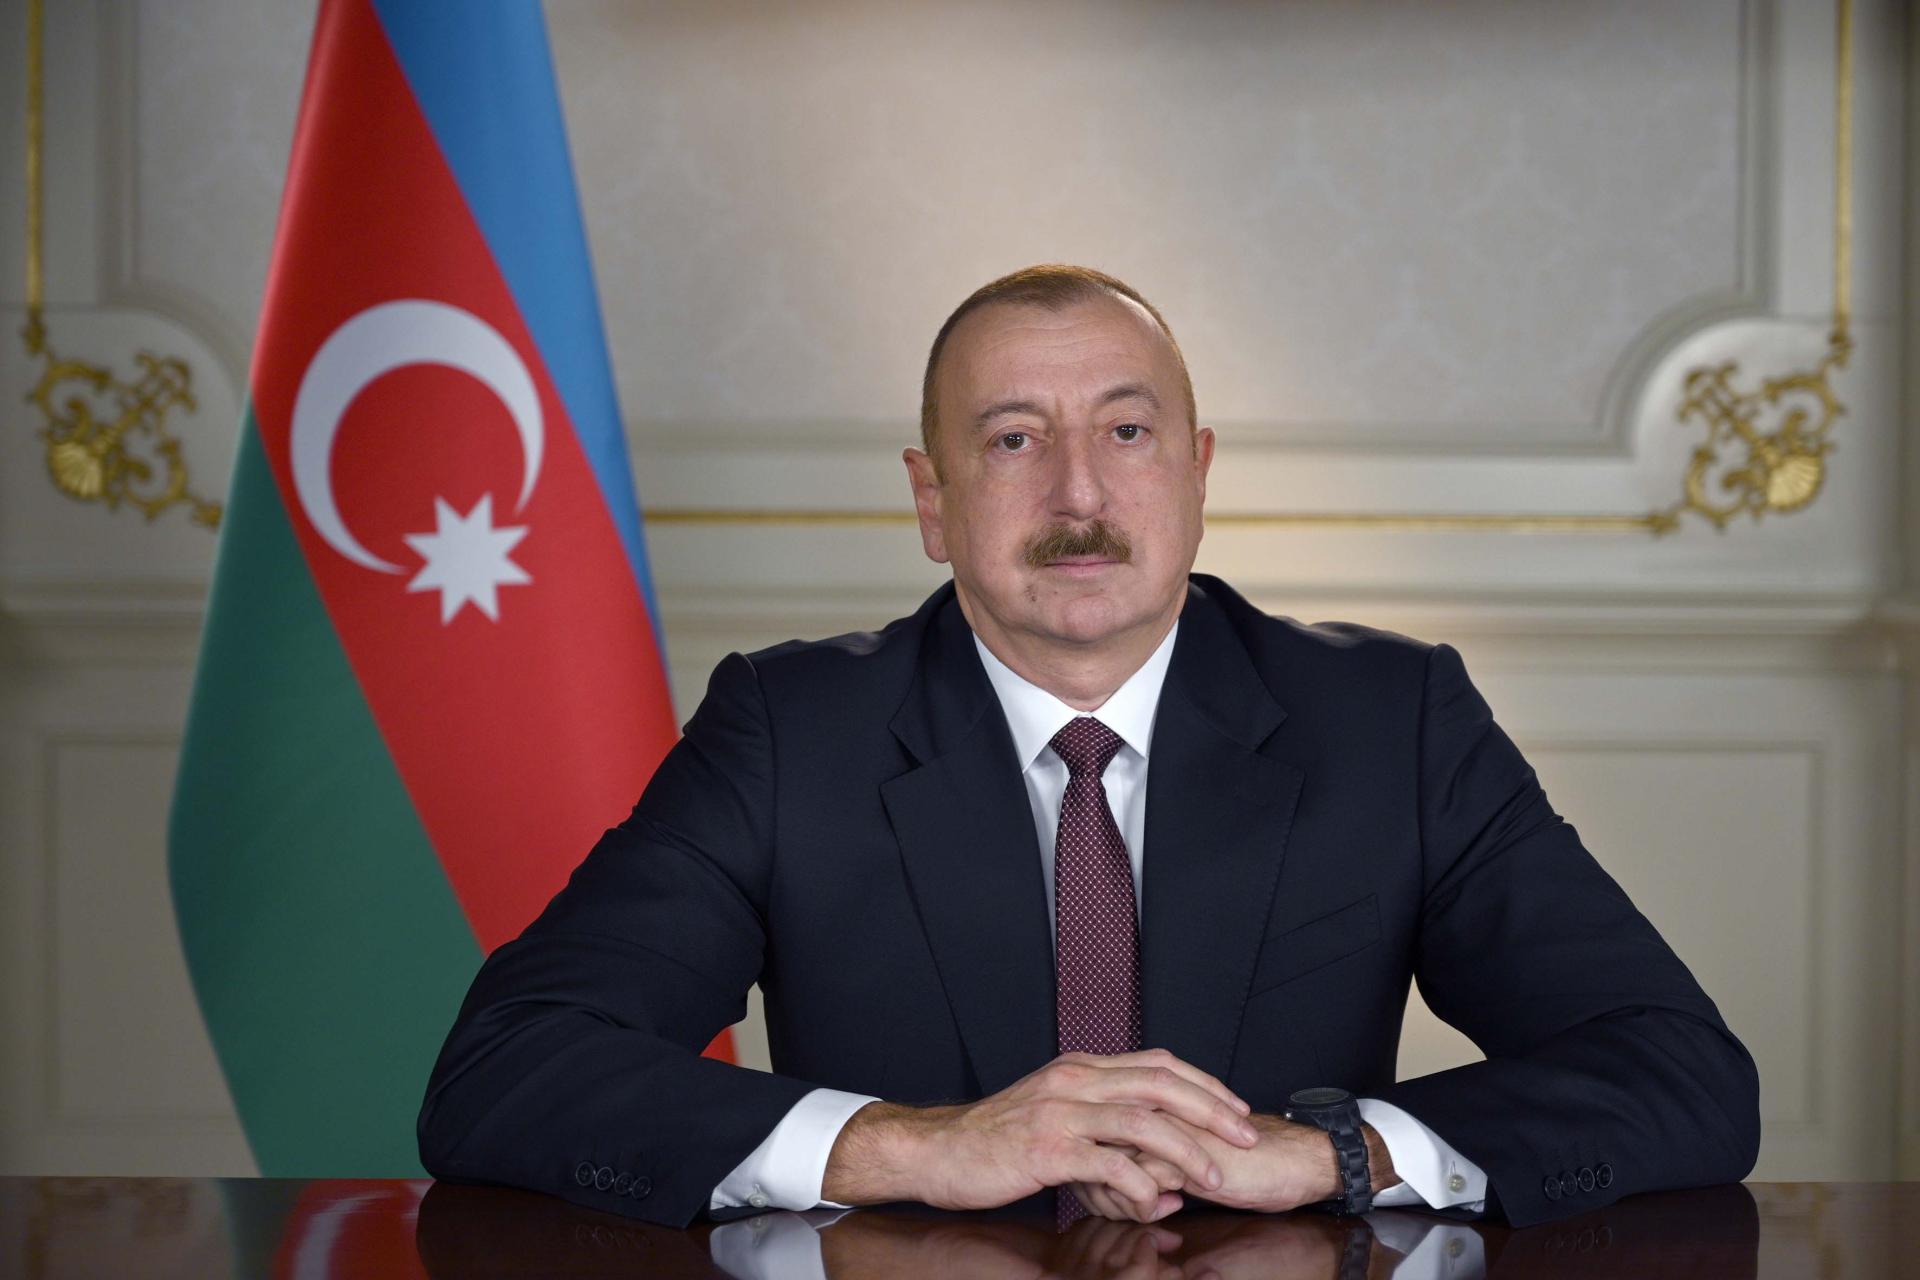 2020/03/ilham_aliyev_main_new_president_310120_1_1585666021.jpg